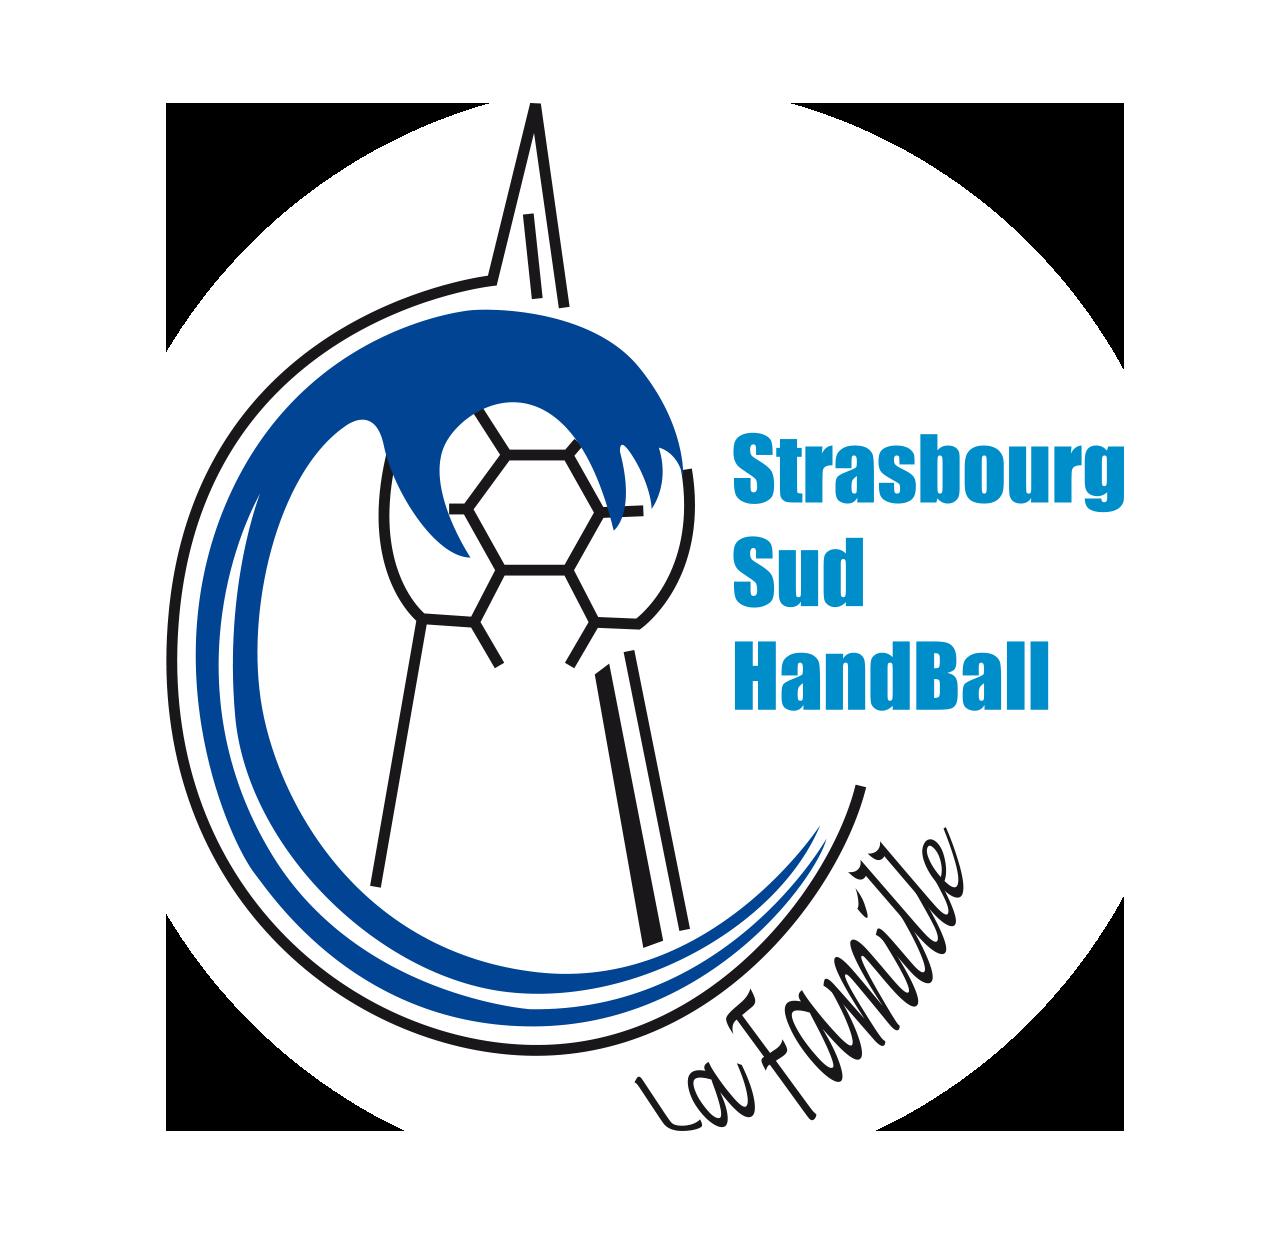 logo SSHB - Strasbourg Sud Handball